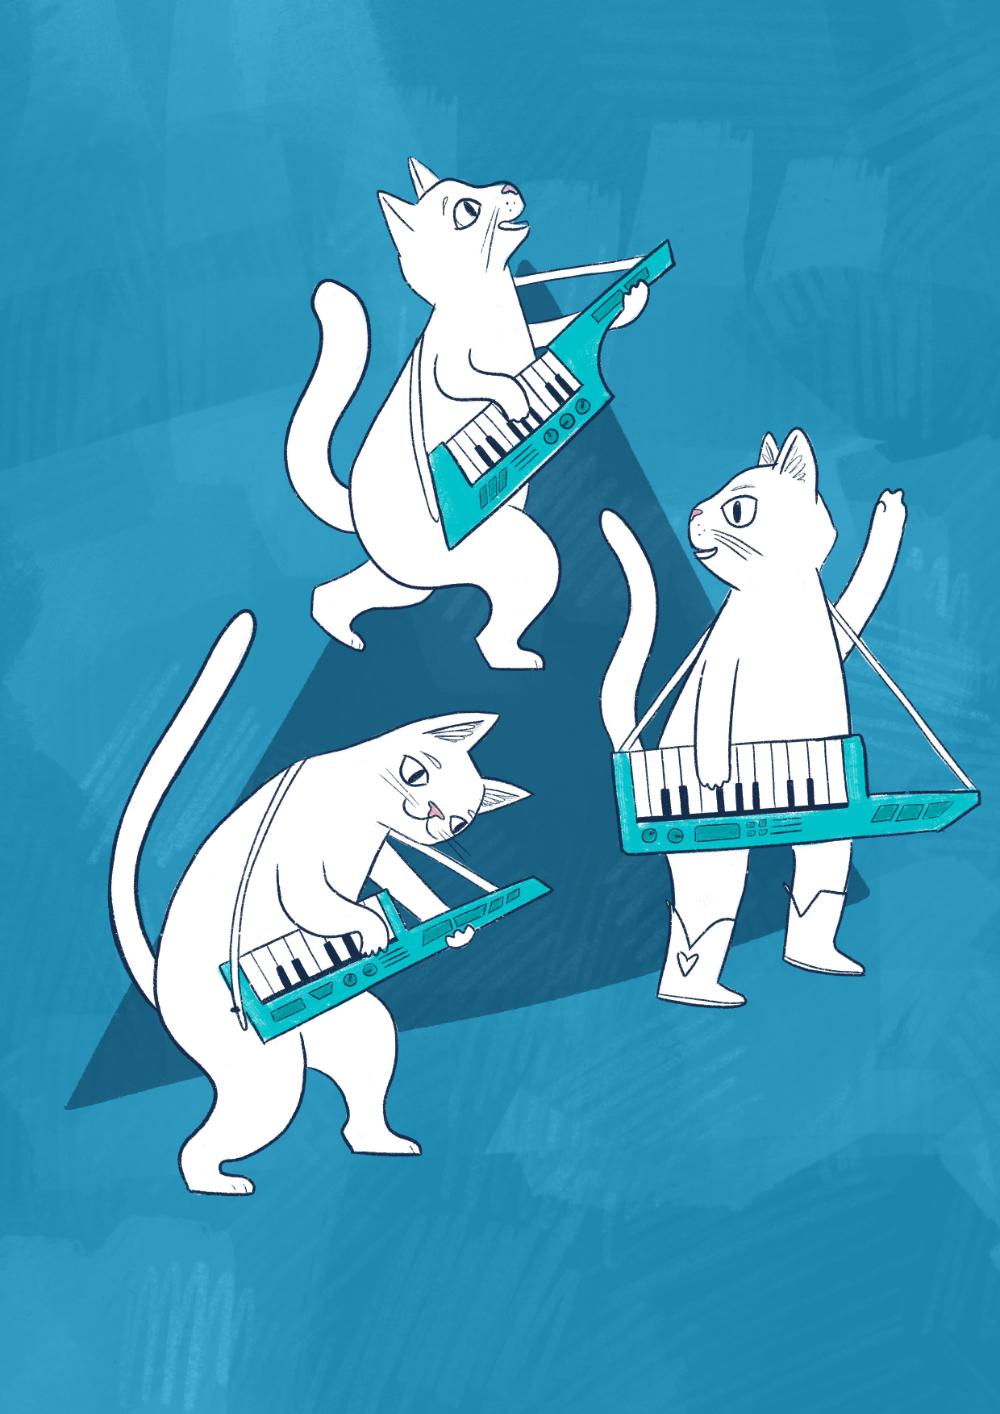 Three cats playing keytars illustration by Amie Sabadin